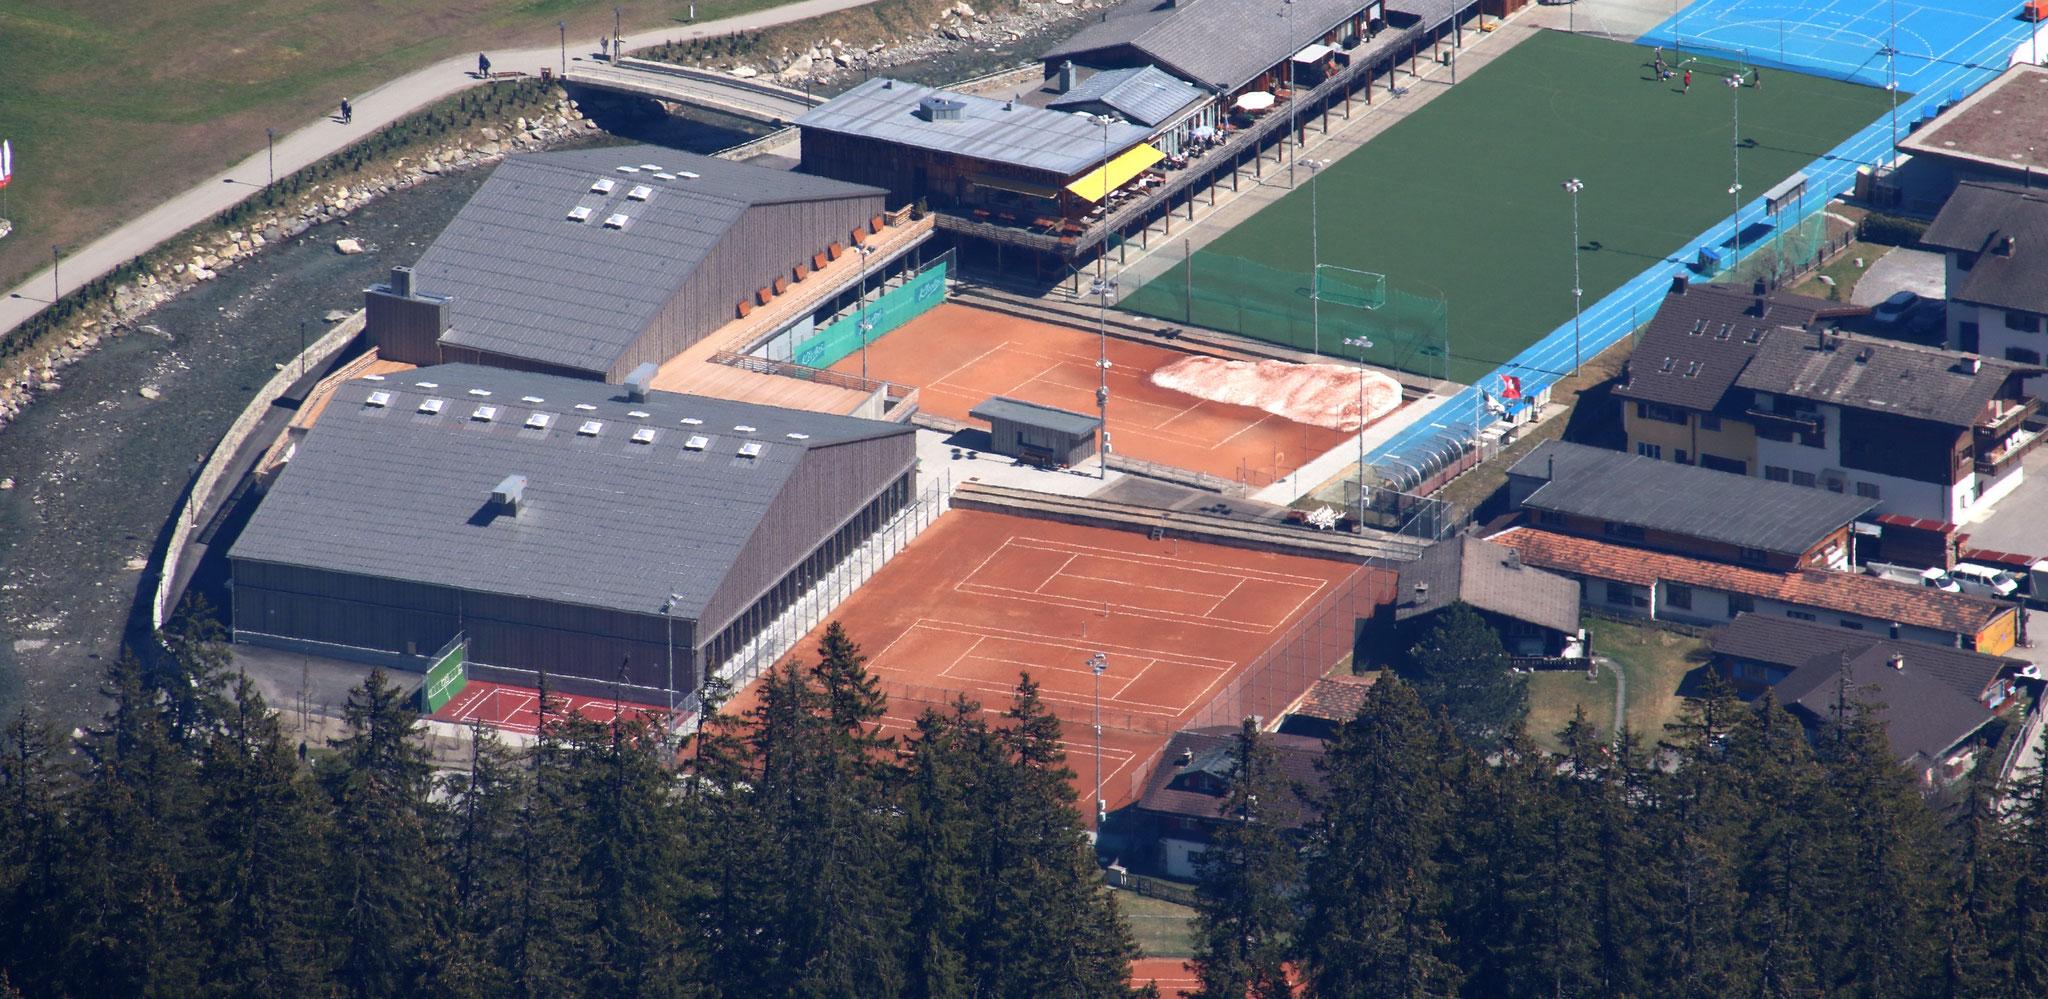 Klosters Platz - Sportzentrum / 6 Sandplätze, 3 Hallenplätze, Kinderplatz, Ballwand, Sport & Spielplätze, Strandbad